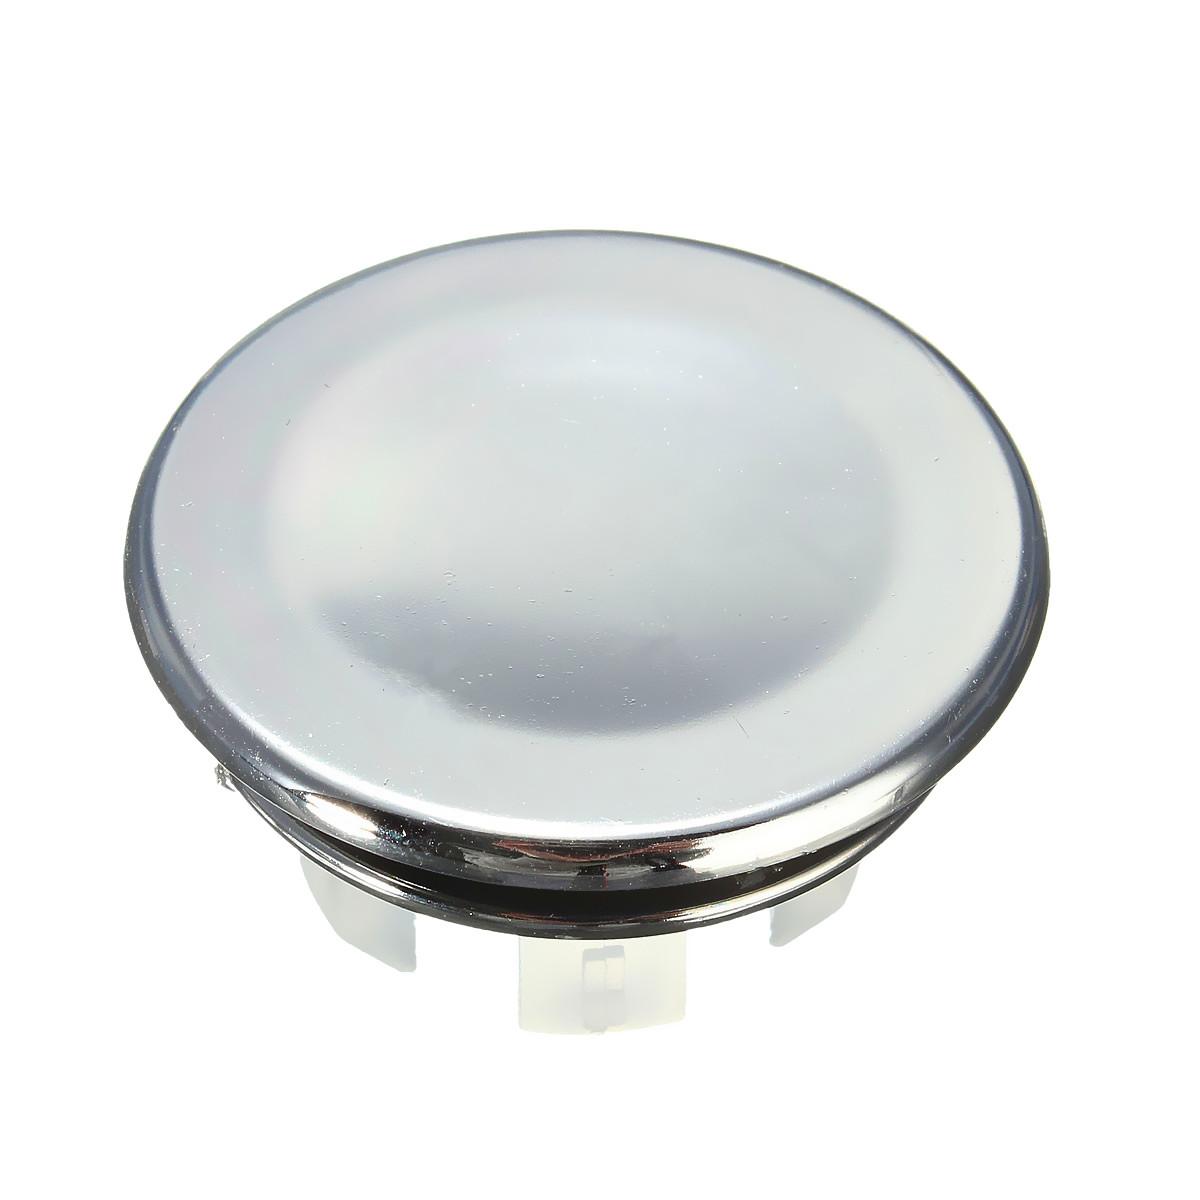 Round Overflow Cover Tidy Trim Chrome For Bathroom Basin